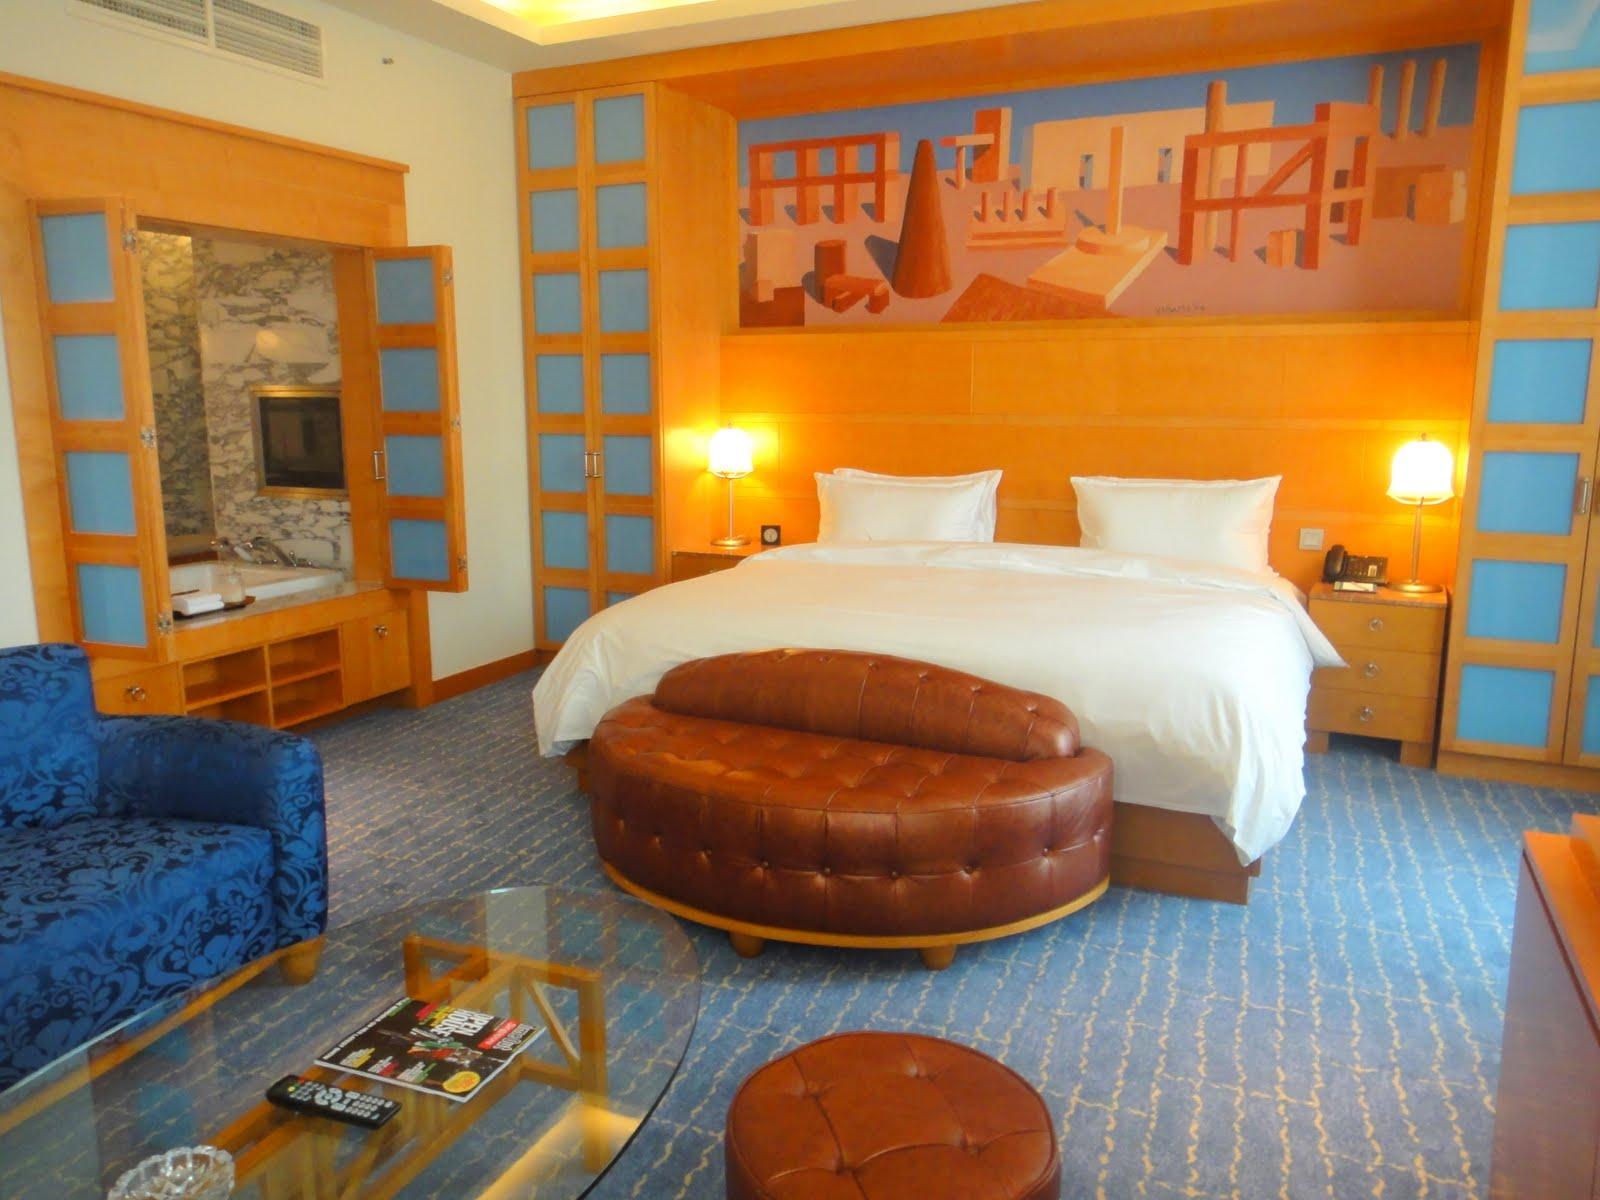 Awa Hotel Room